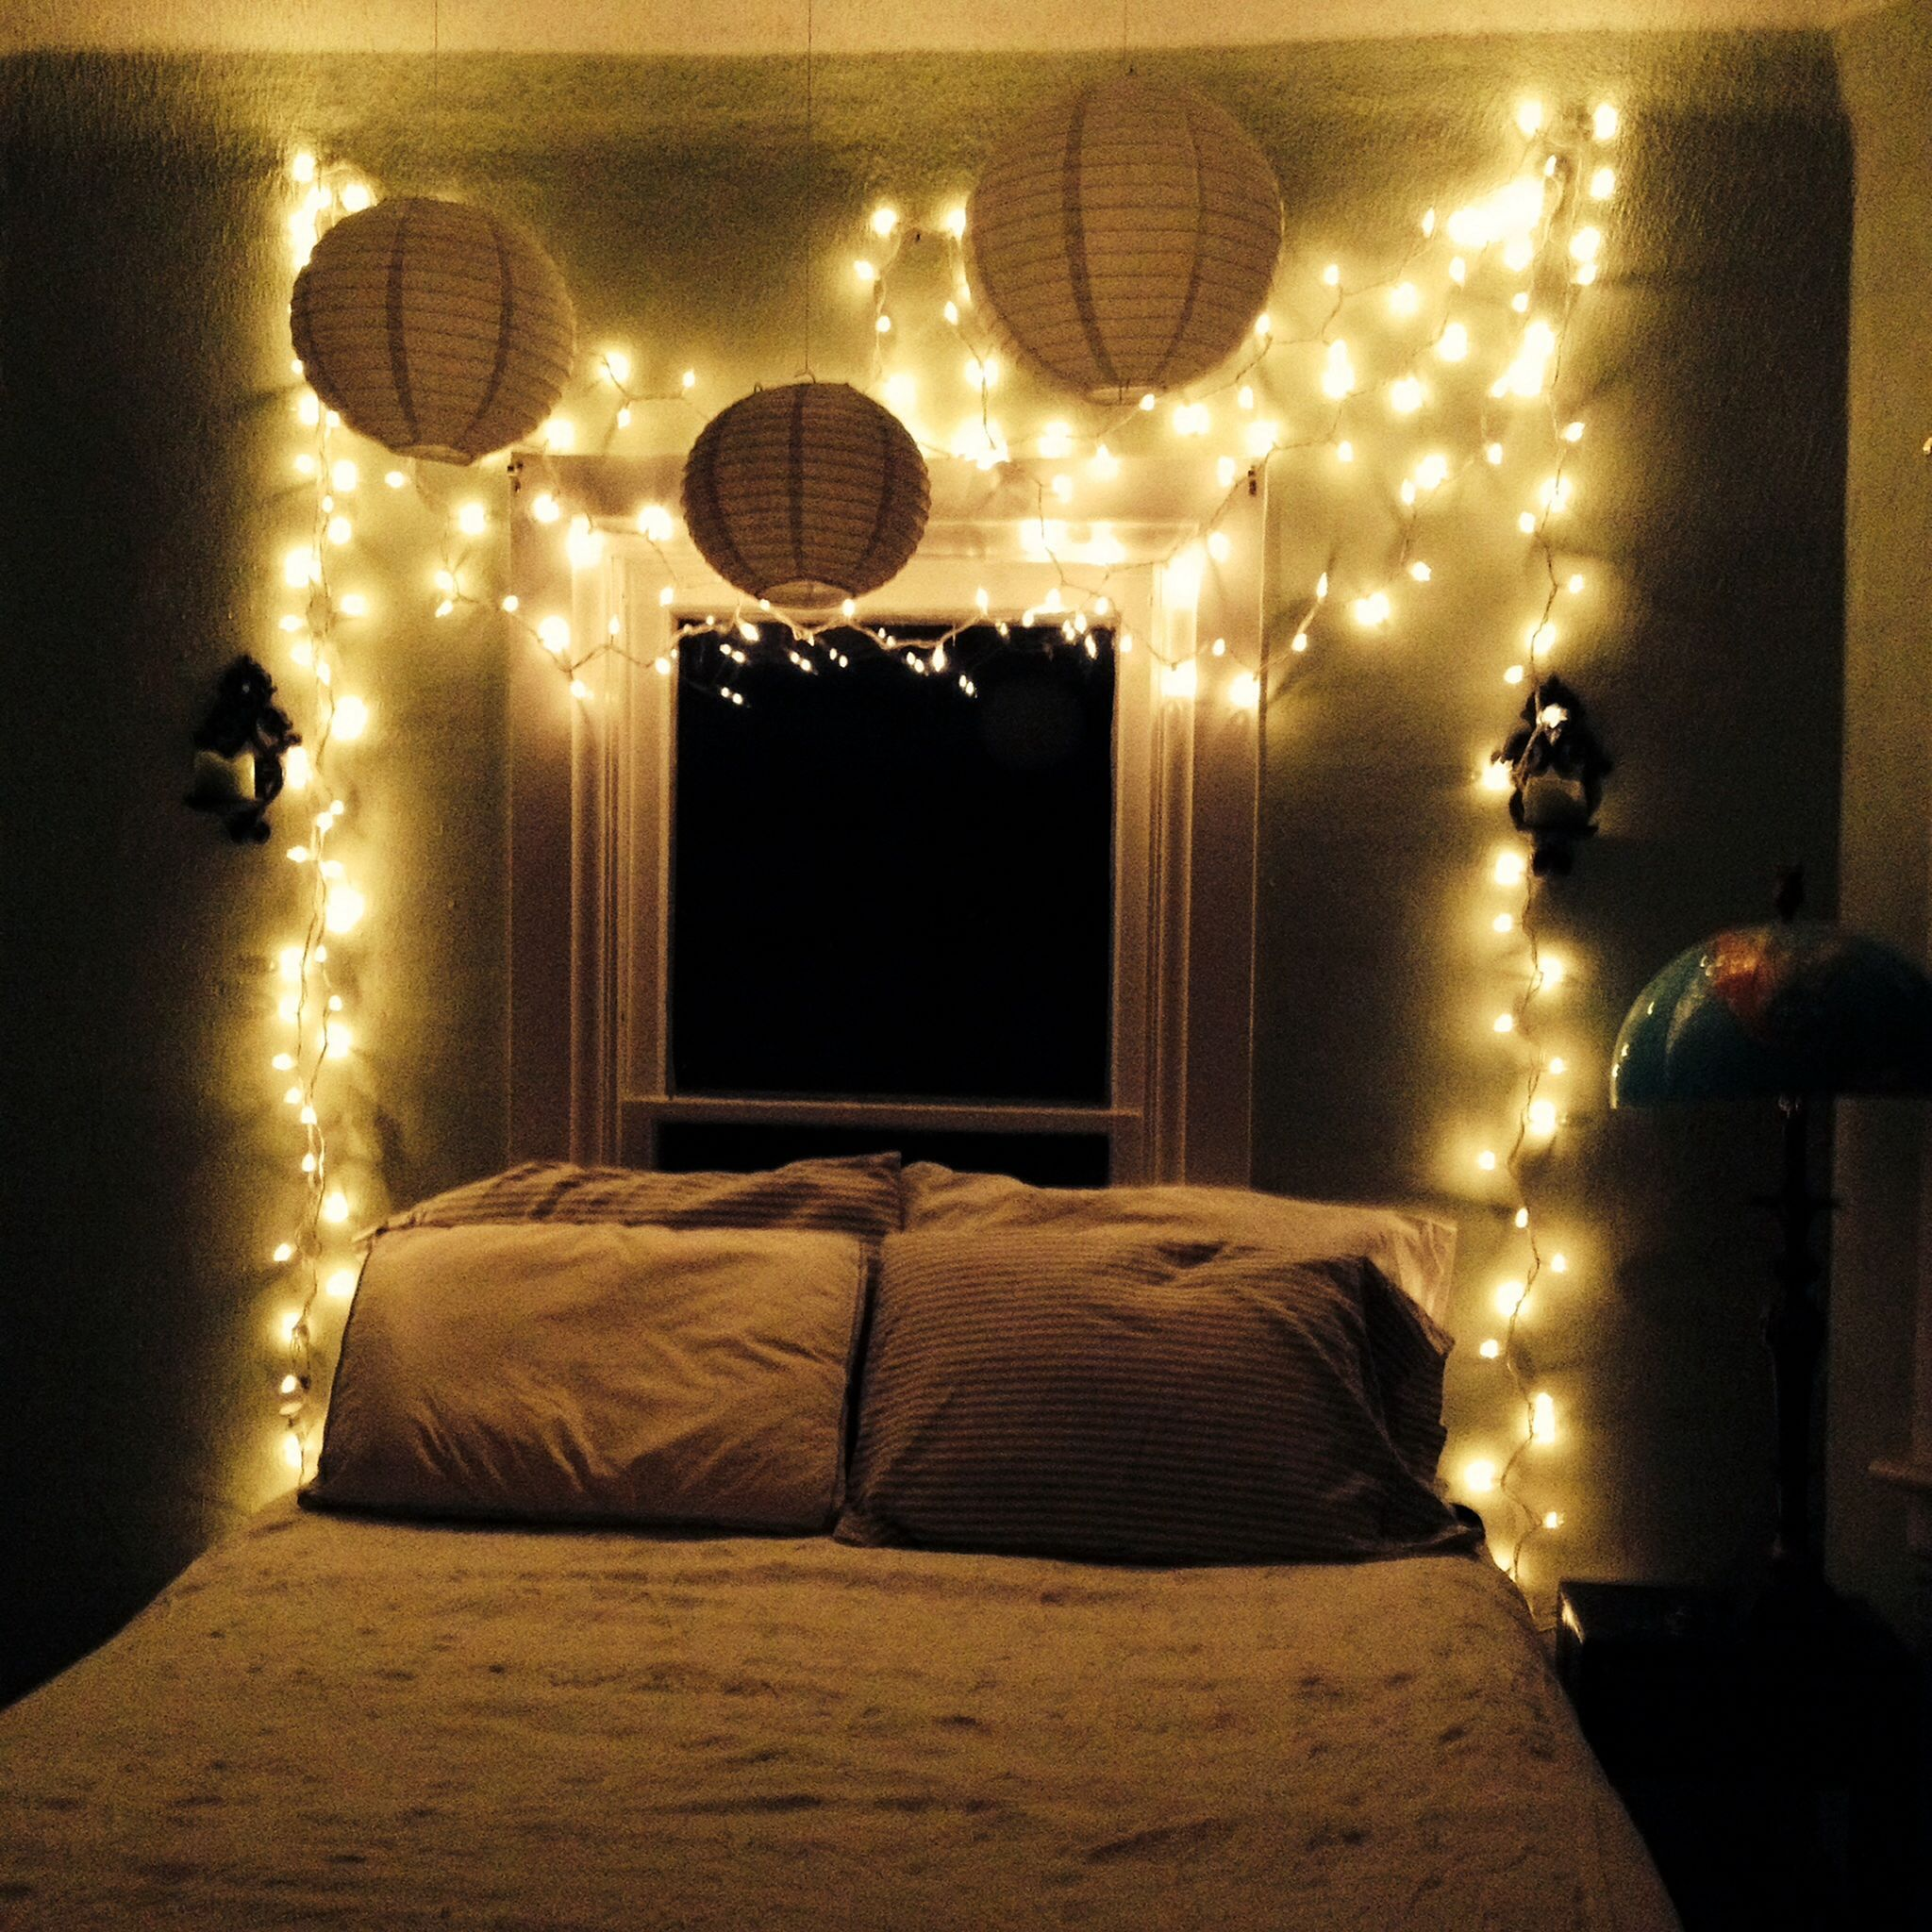 Amazing Bedroom Lighting Ideas: 35+ Amazing Christmas Light Bedroom Decoration Ideas